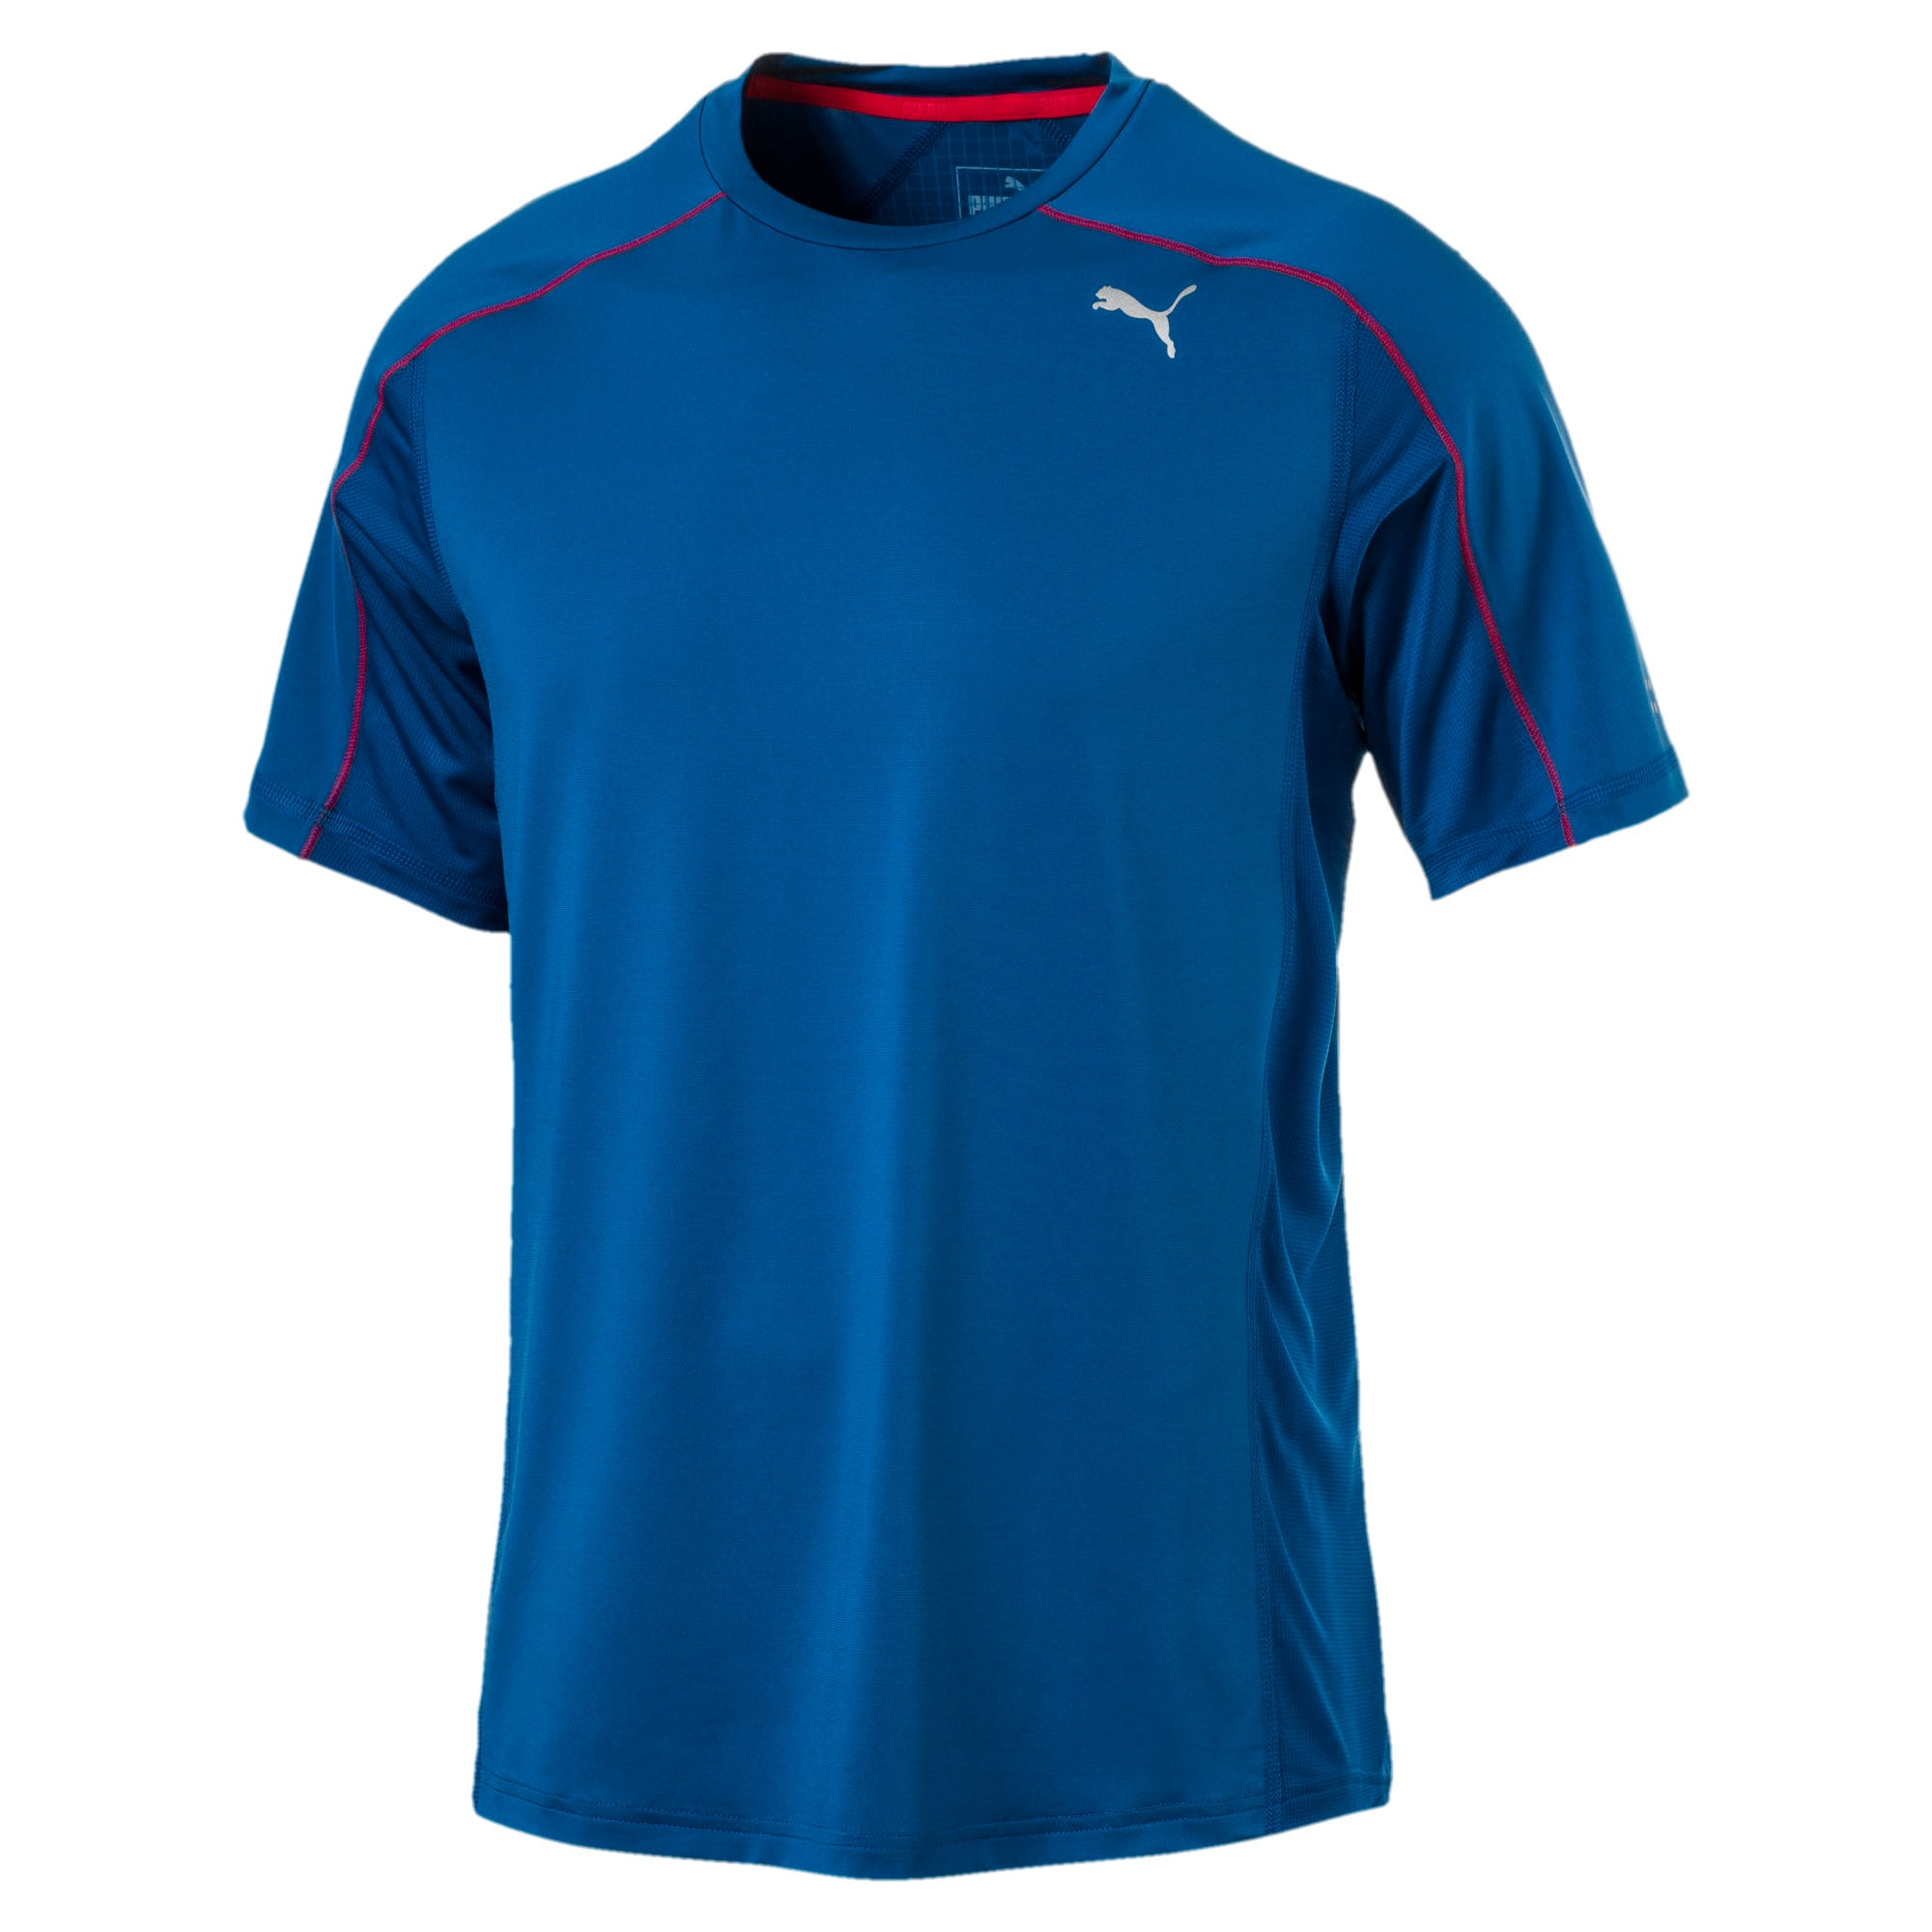 Thumbnail 1 of Running Men's Speed T-Shirt, Lapis Blue, medium-IND